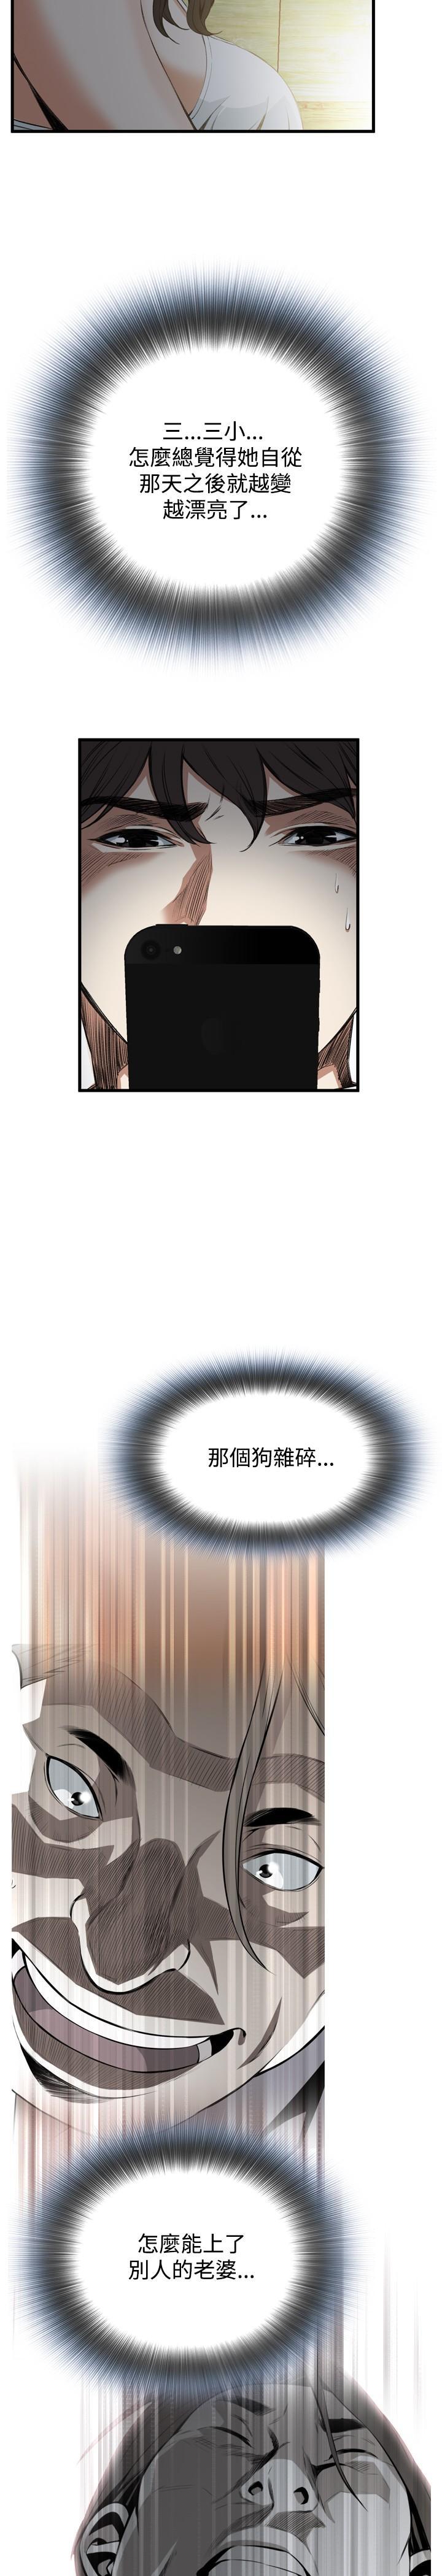 Take a Peek 偷窥 Ch.39~55 [Chinese]中文 188